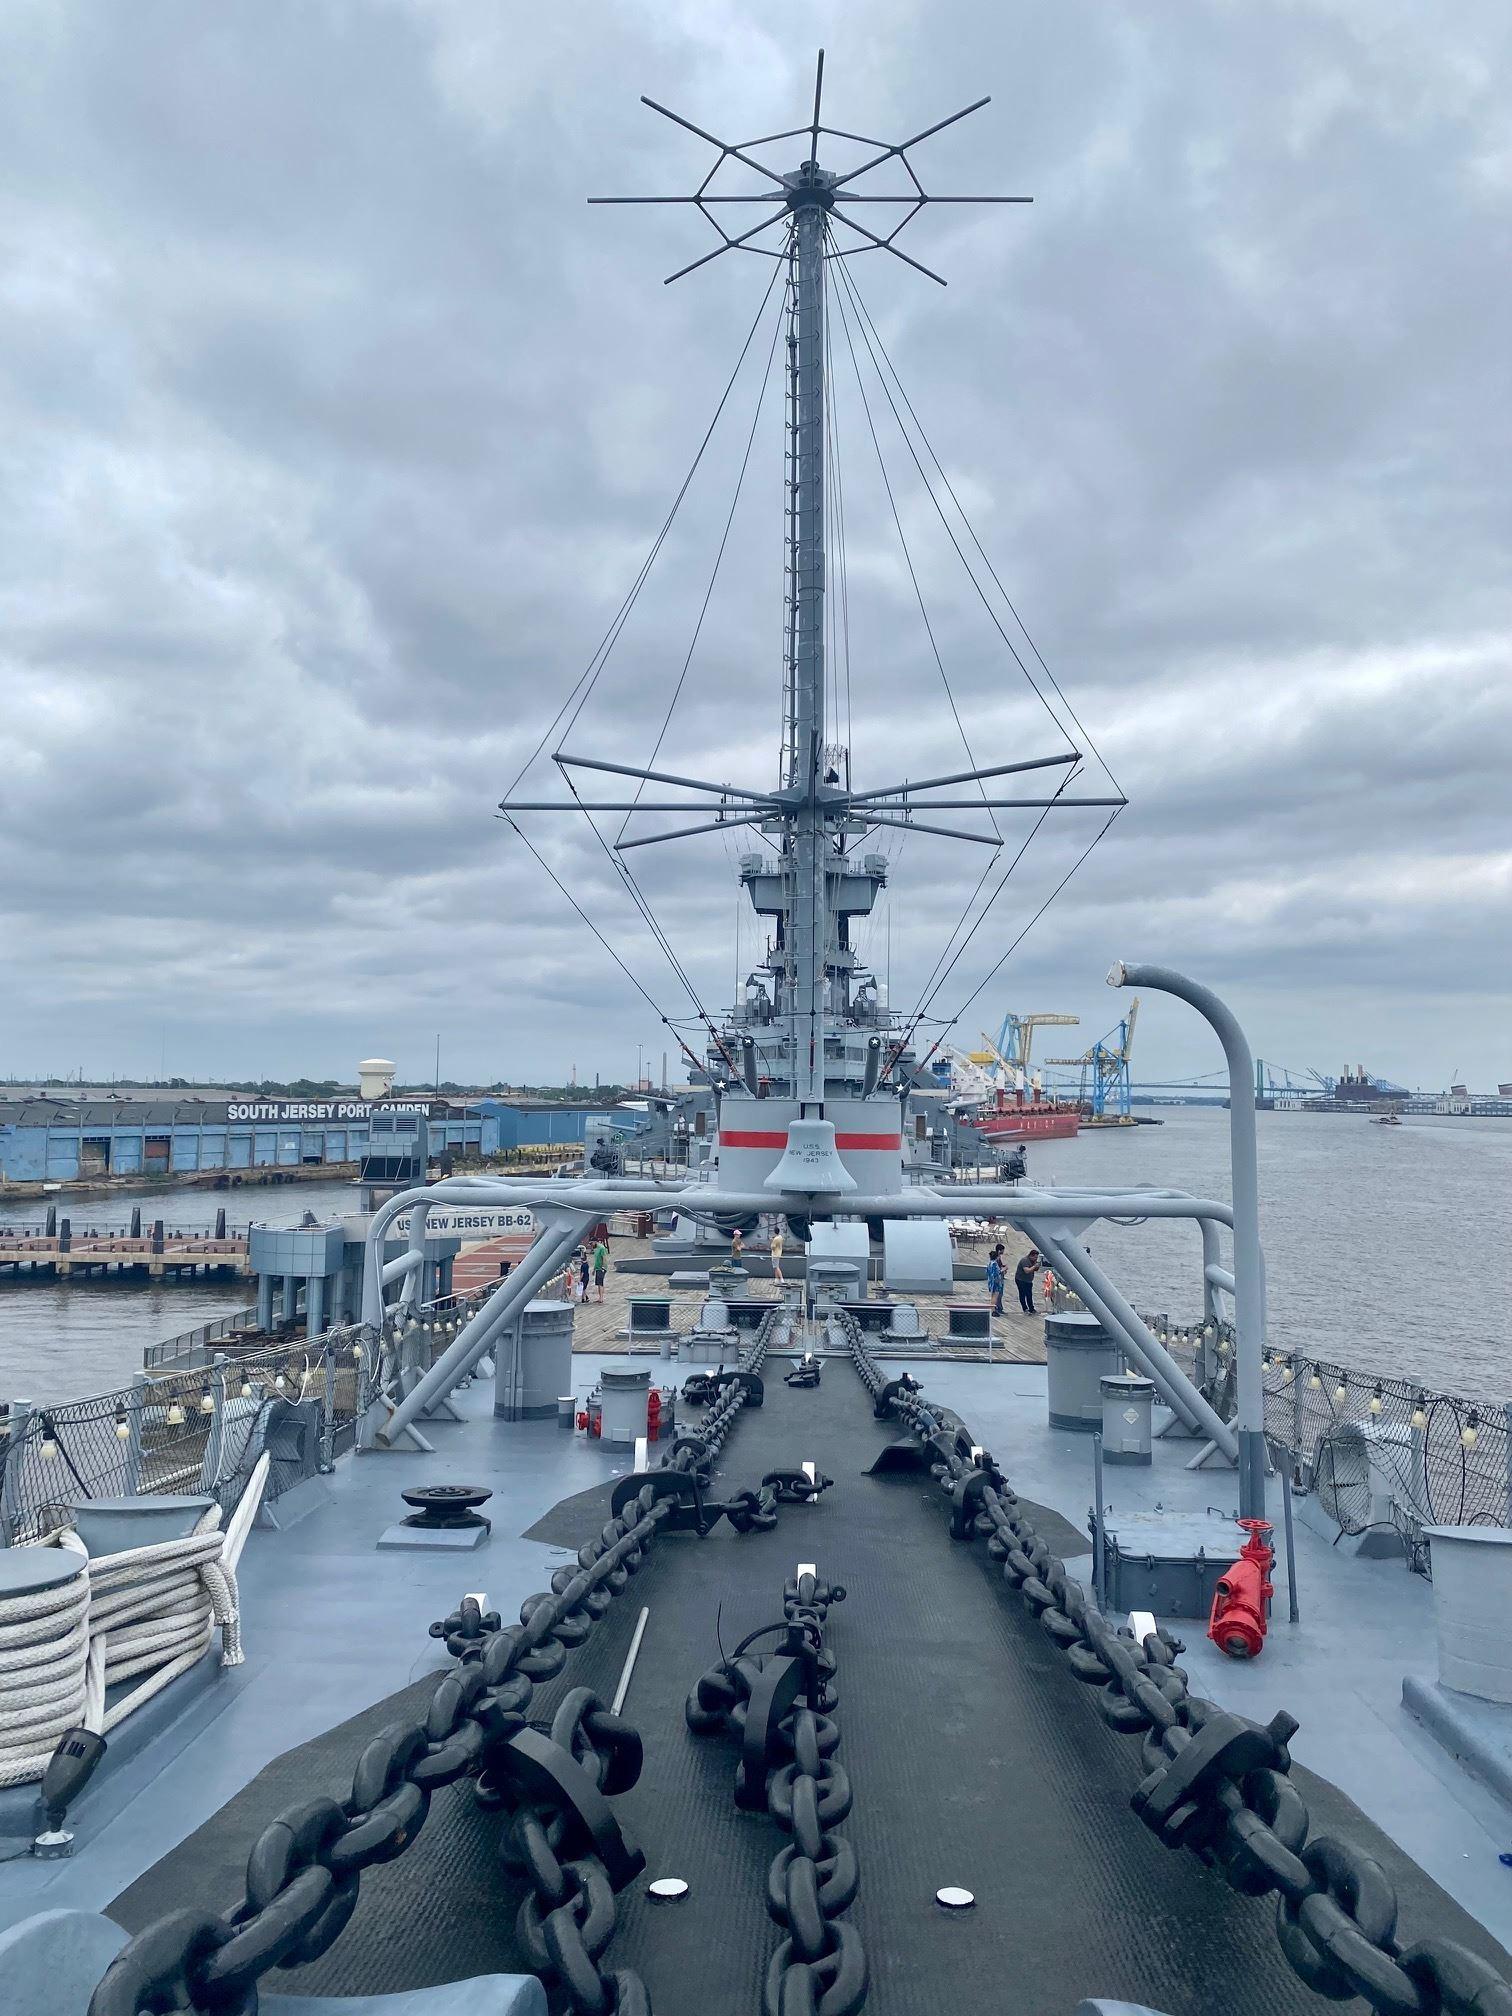 nj museums battleship new jersey museum nj